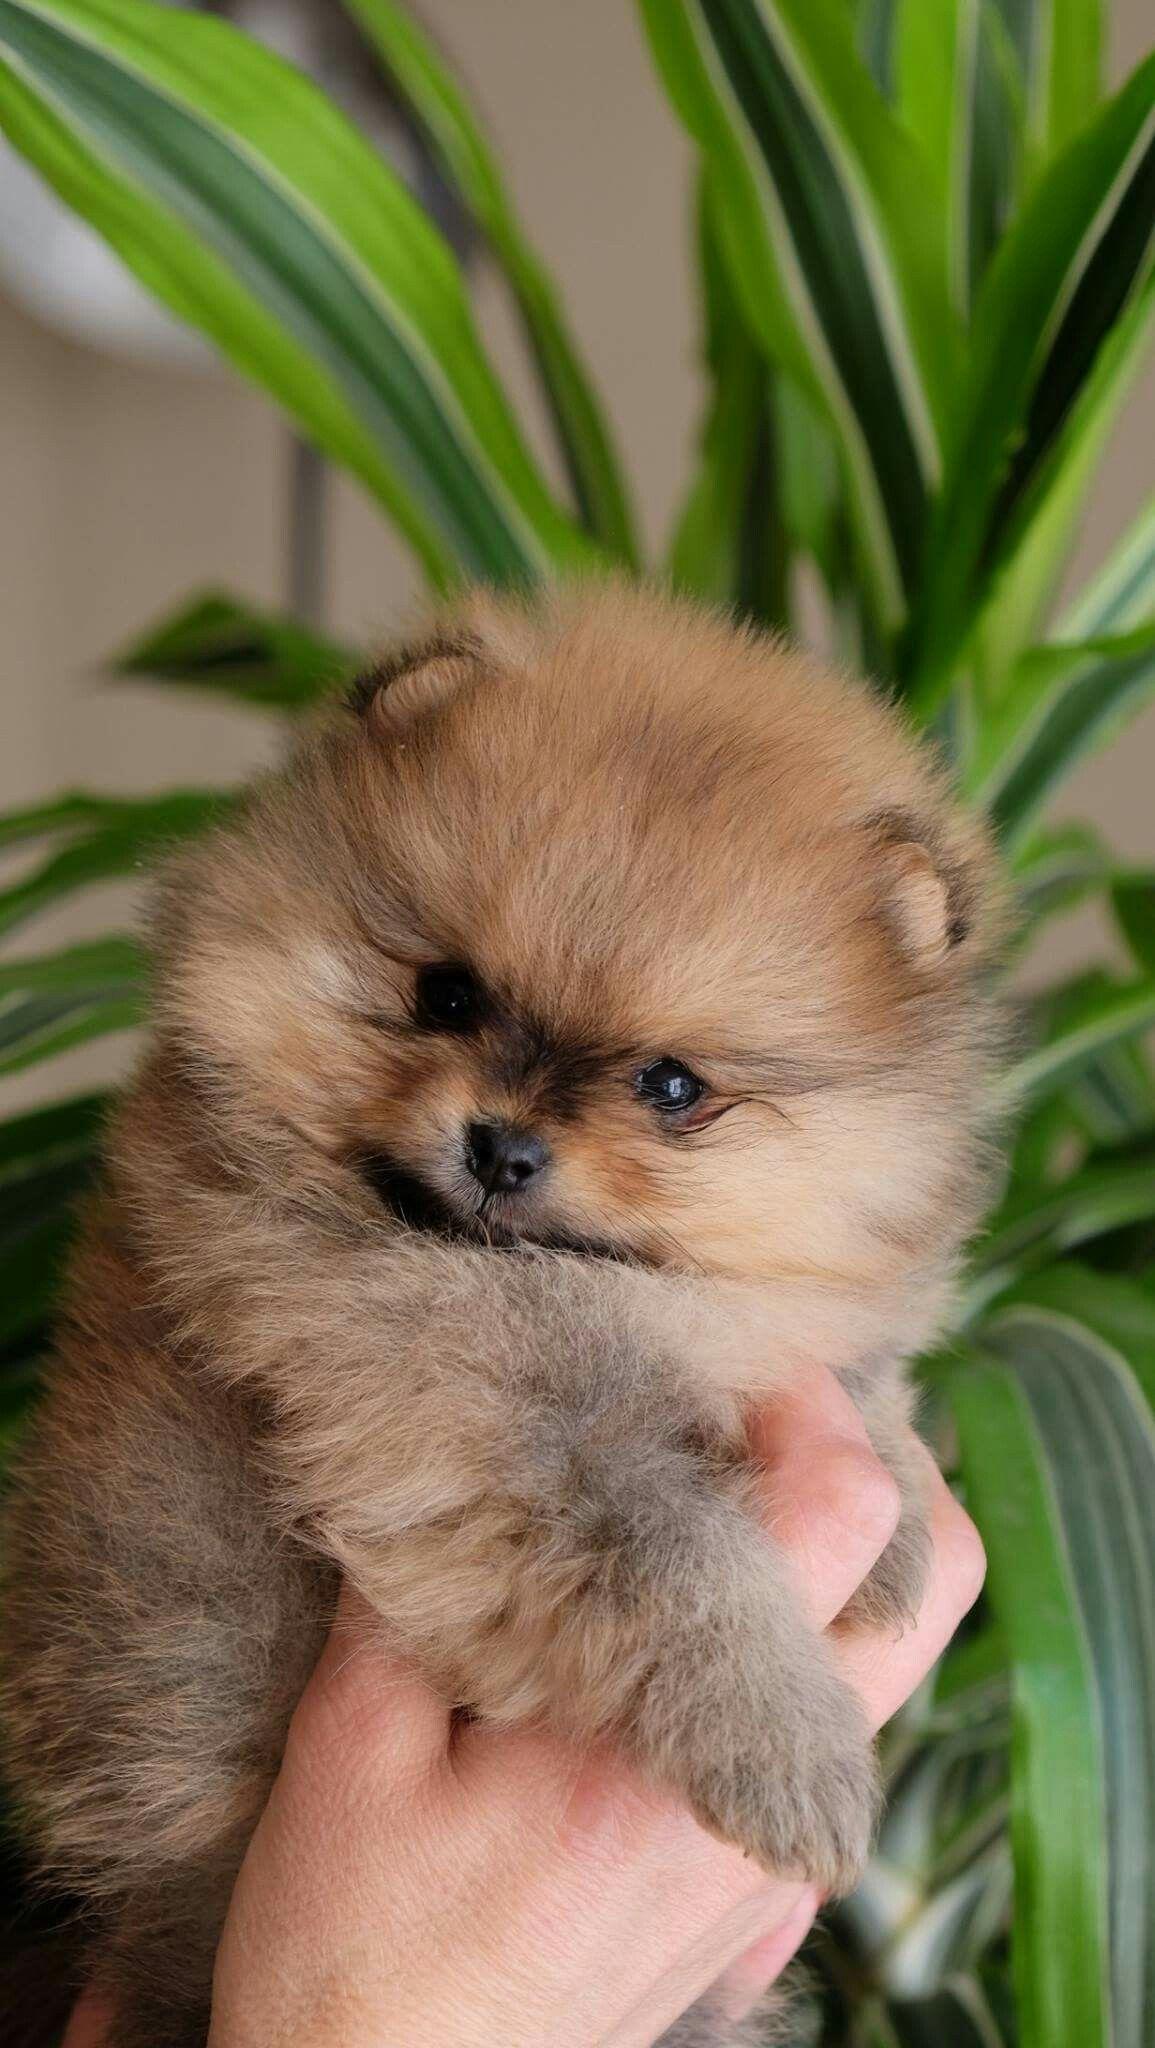 Baby animals instagram - Pinterest Jenmacho2 Instagram Jen_macho Snapchat Jen51 Cutest Animalsbaby